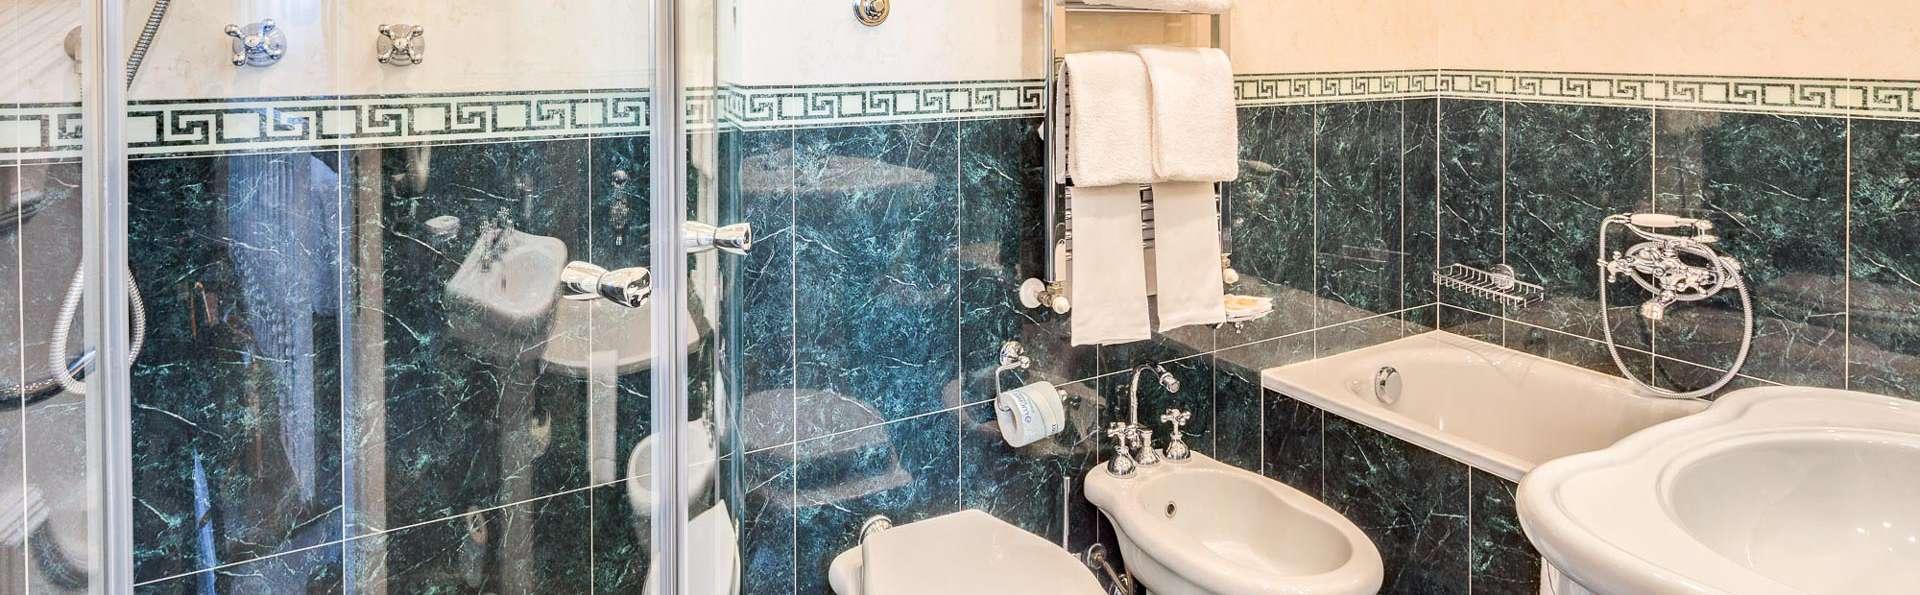 Hotel Roma - EDIT_N2_BATHROOM_03.jpg